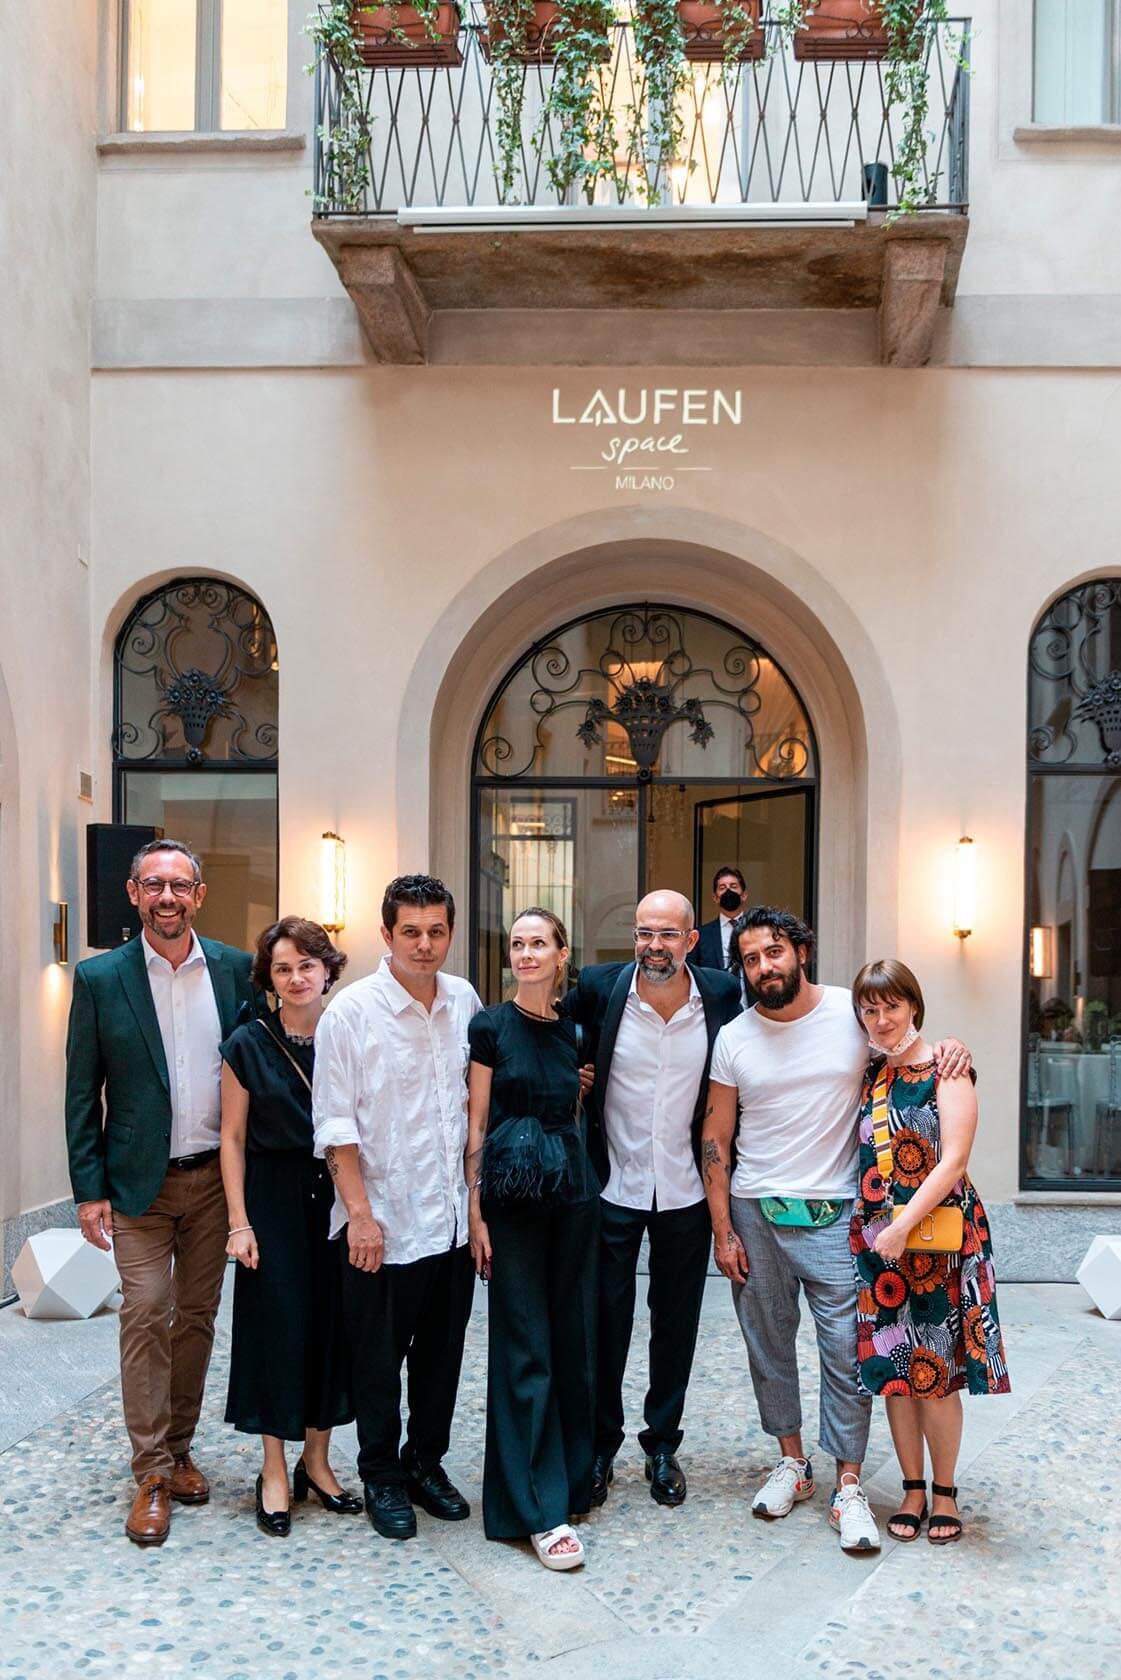 Group picture of Roger Furrer, Tatiana Kharchenko, Serdar Yanikov, Grazia Vanuzzo, Antonio Linares, Max Kasymov and Kseinia Rudkovskaya.